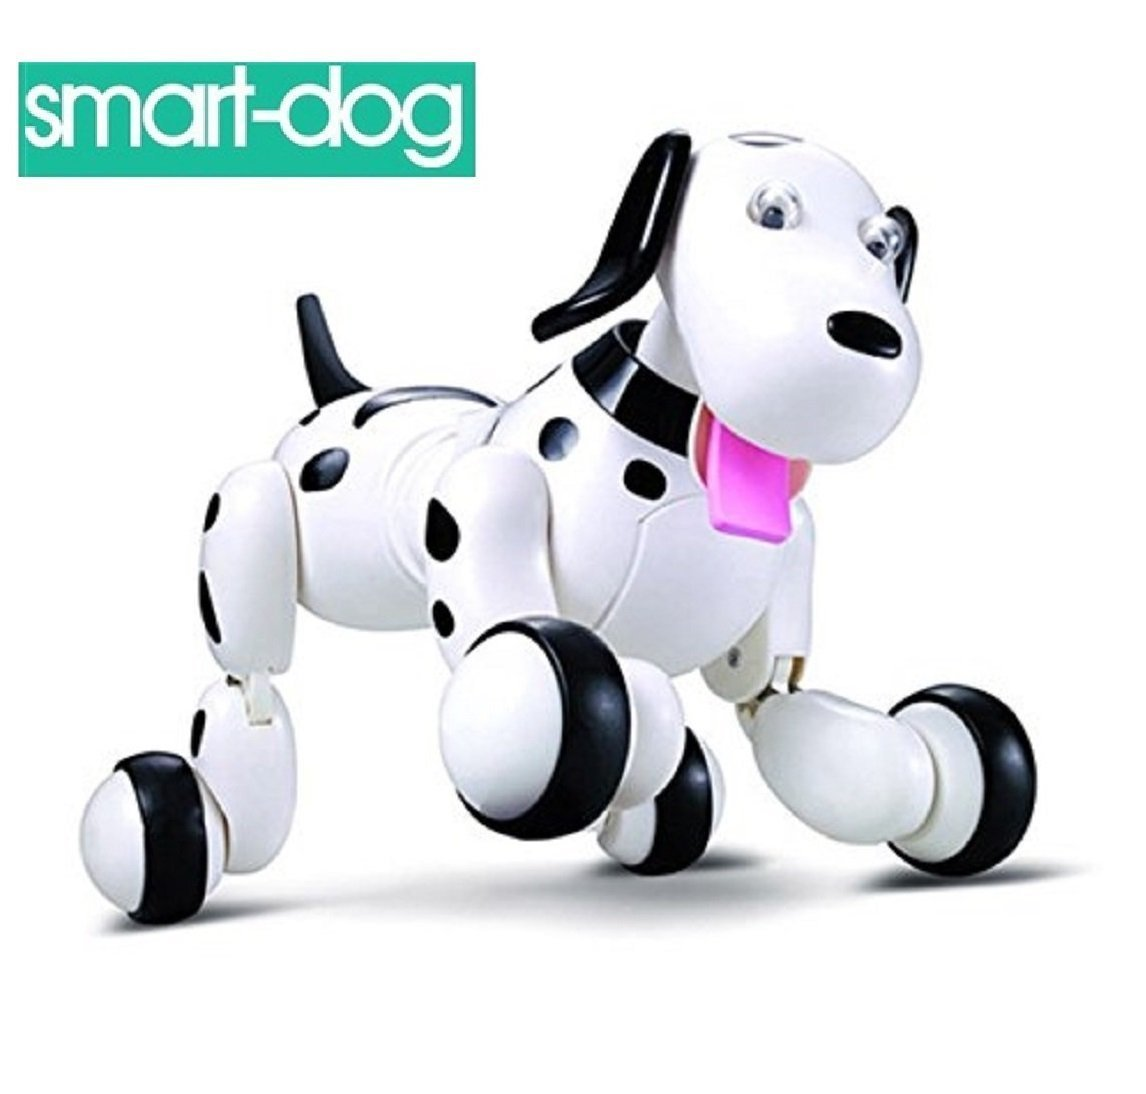 sainsmart-jr-electronic-rc-smart-dog